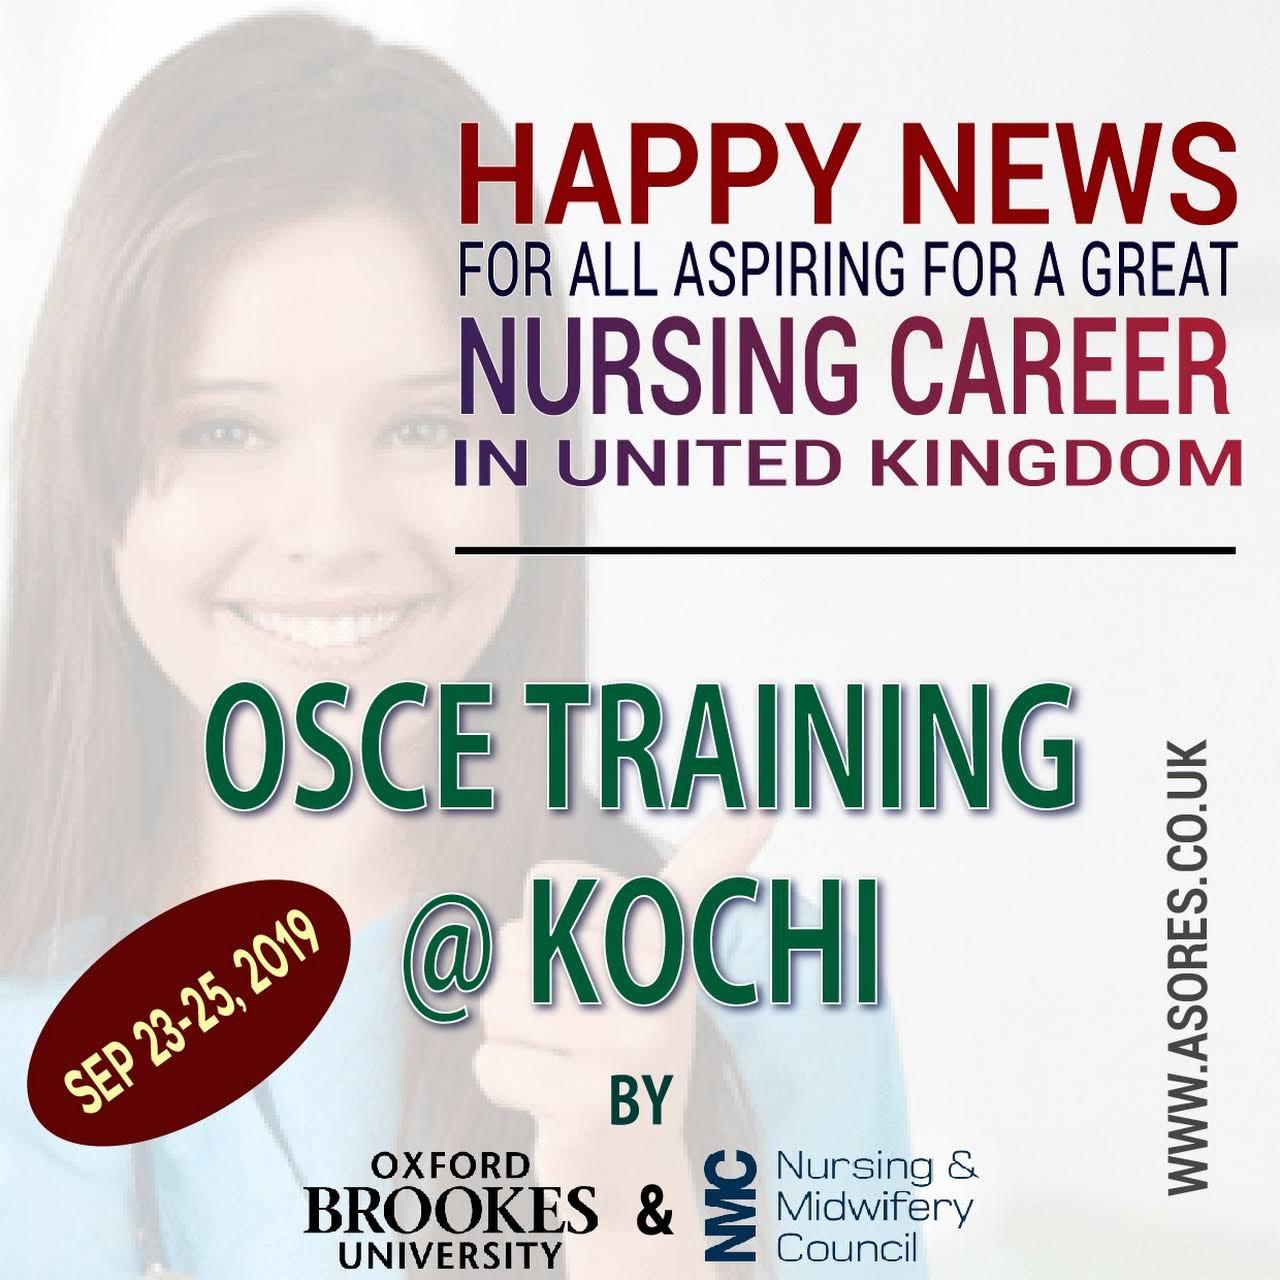 ASORES Overseas Services UK Ltd - Recruiter